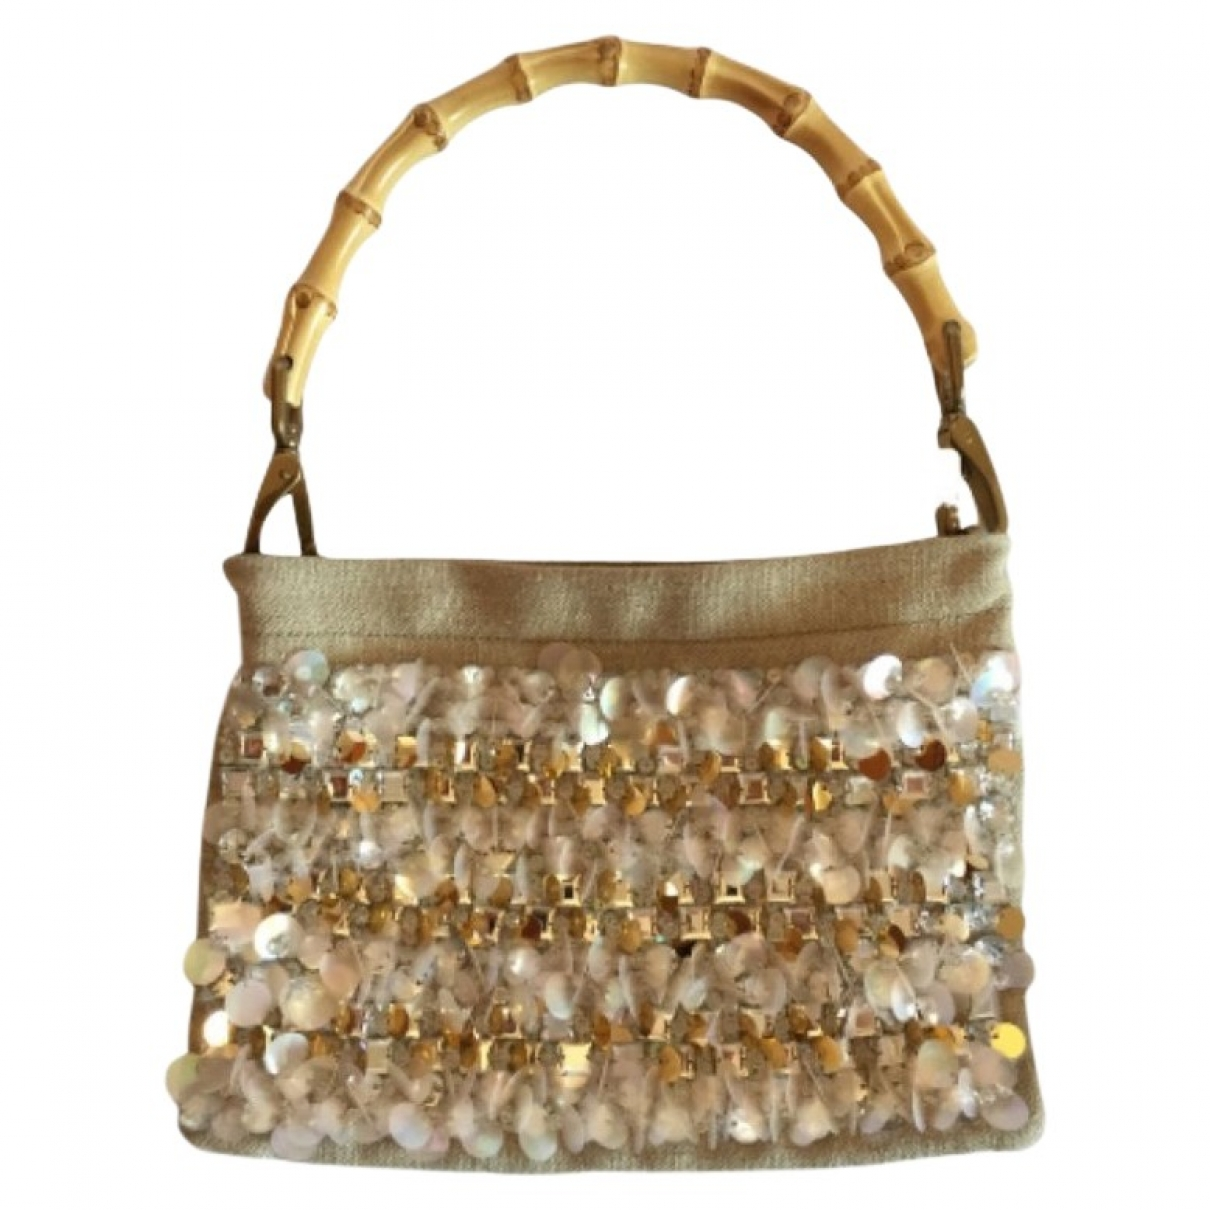 Miu Miu \N Beige Linen handbag for Women \N